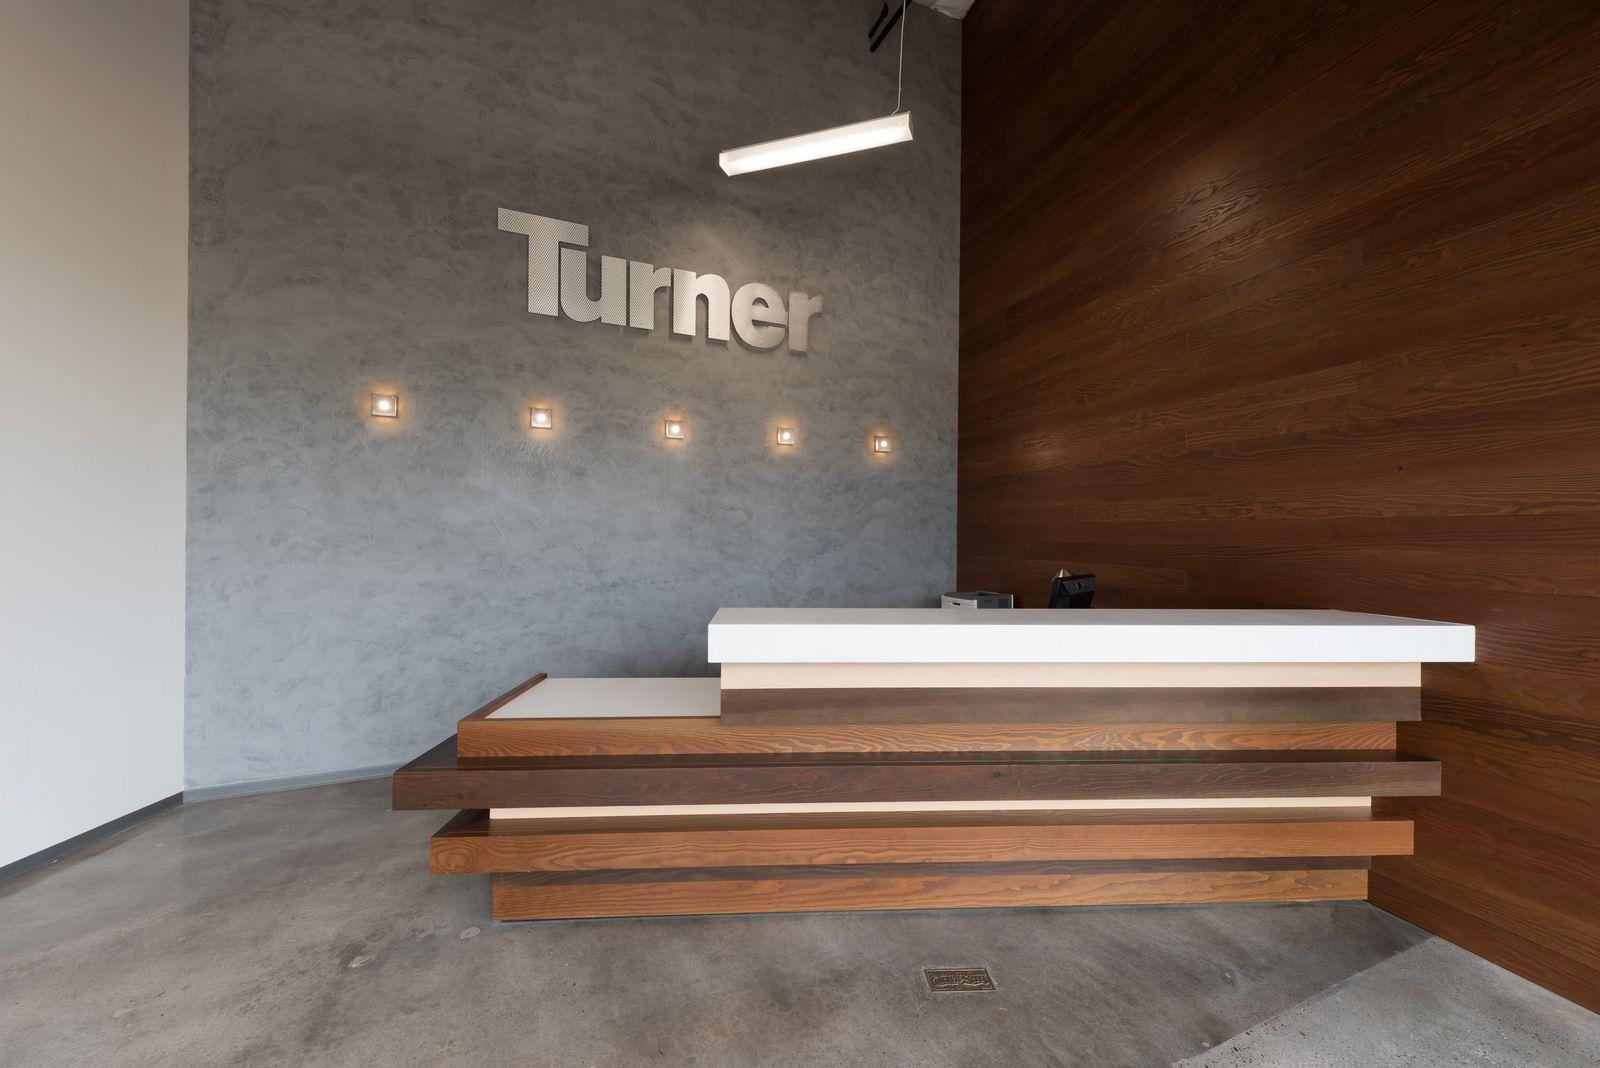 Turner Construction Offices San Diego Office Snapshots Reception Desk Office Interior Design Office Reception Design